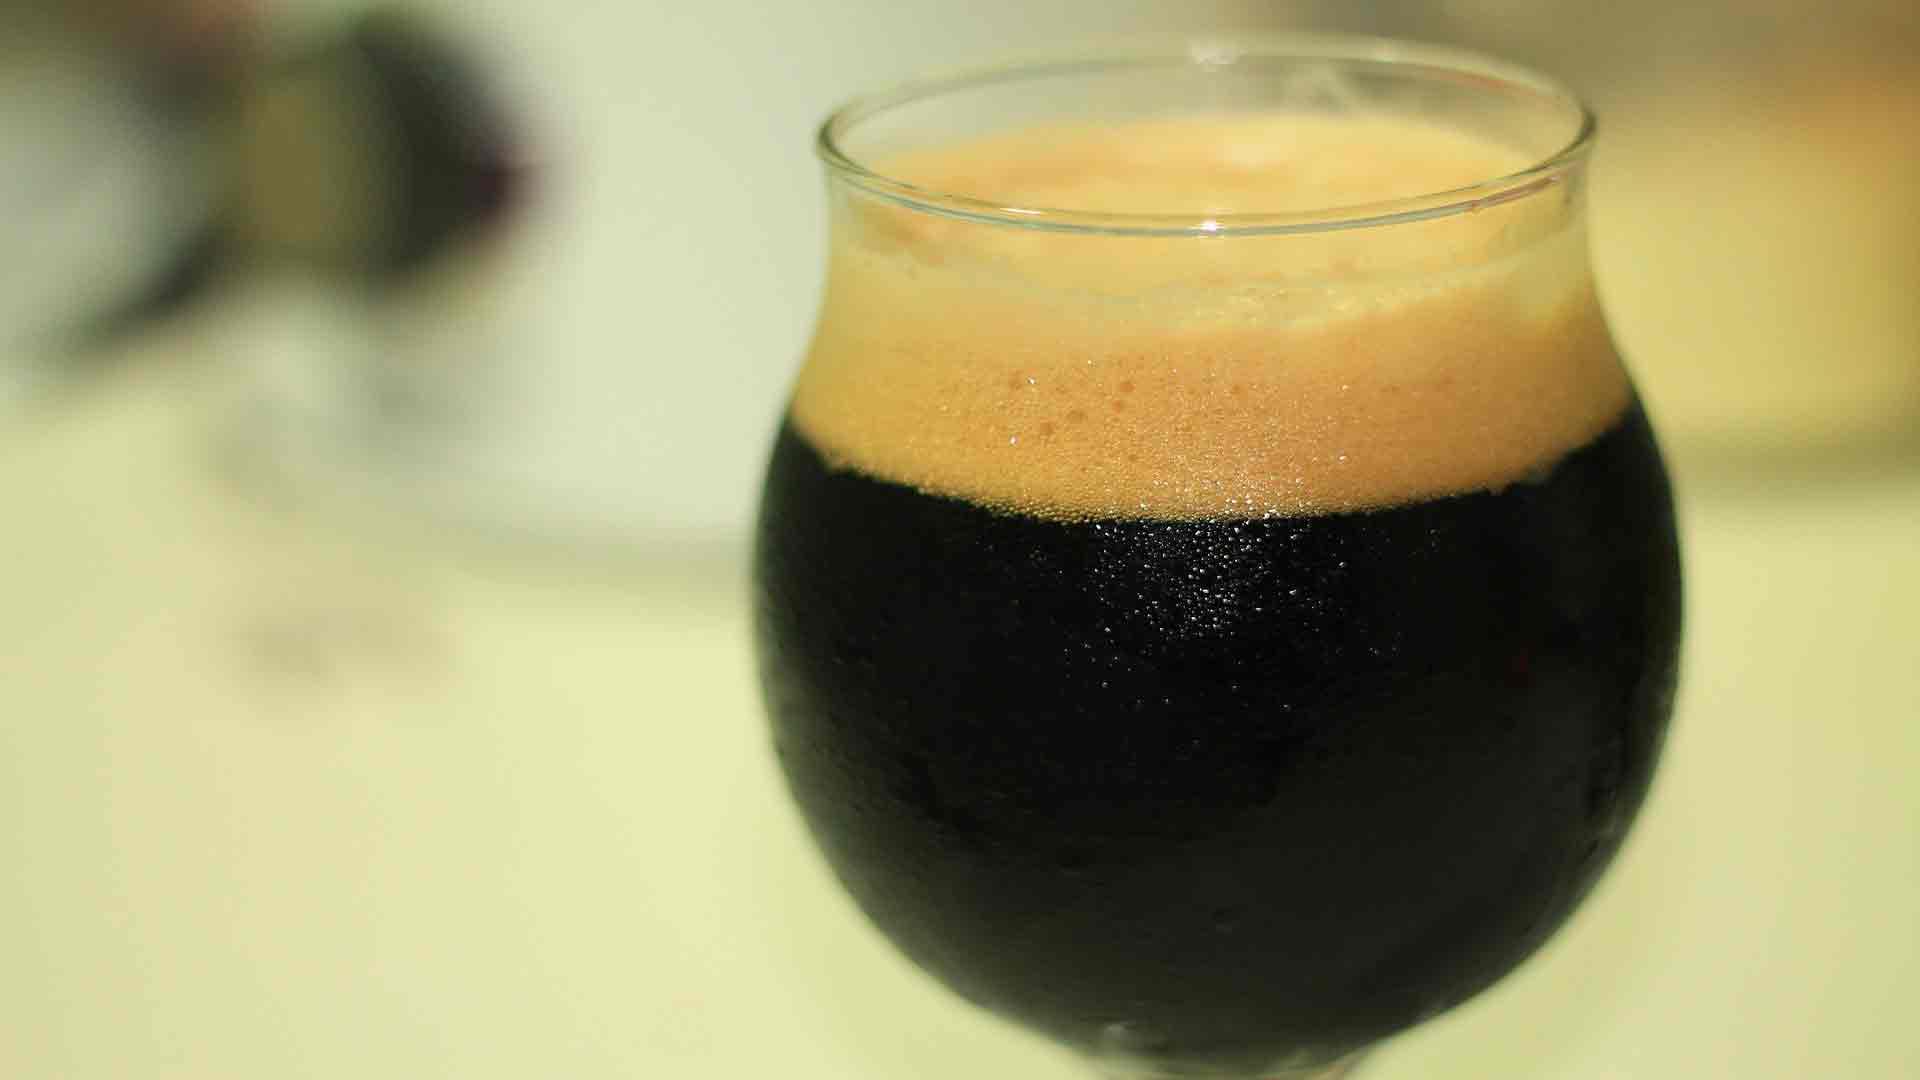 Te-gusta-la-cerveza-negra-1920